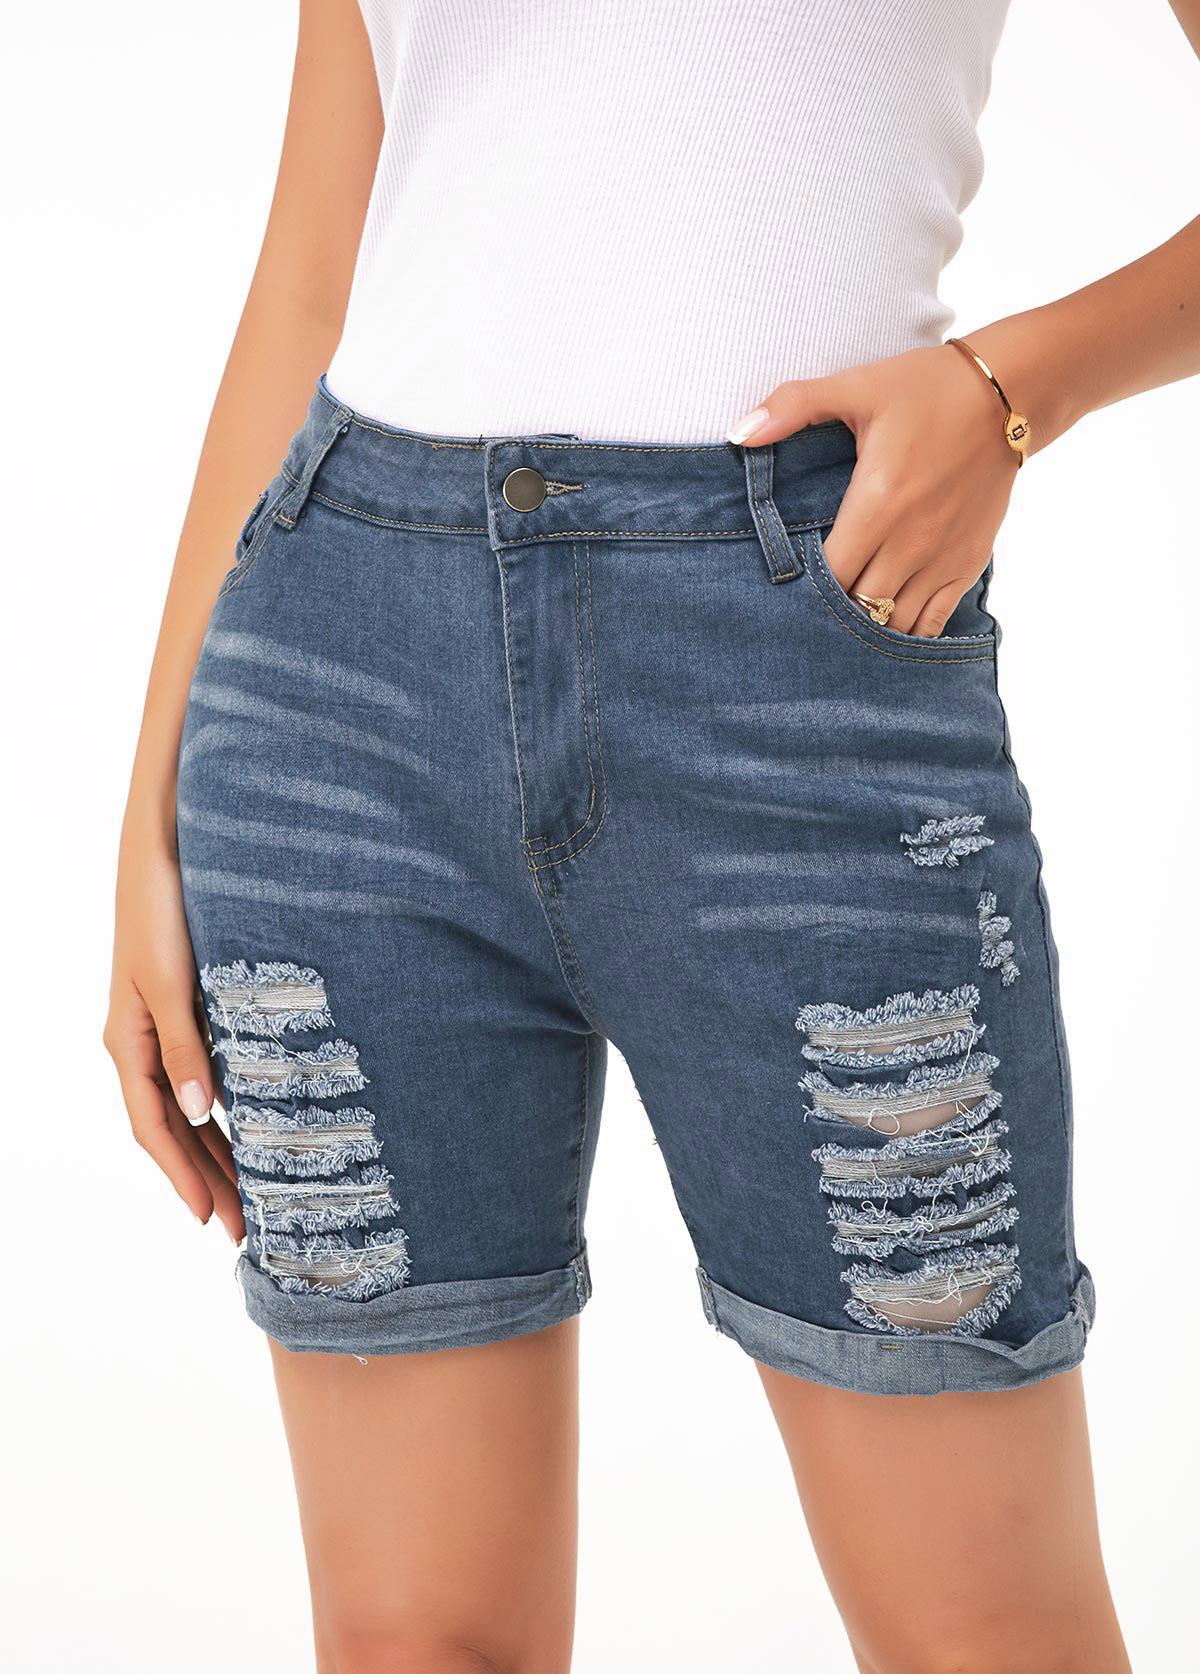 ROTITA Denim Blue Shredded Button Up Shorts